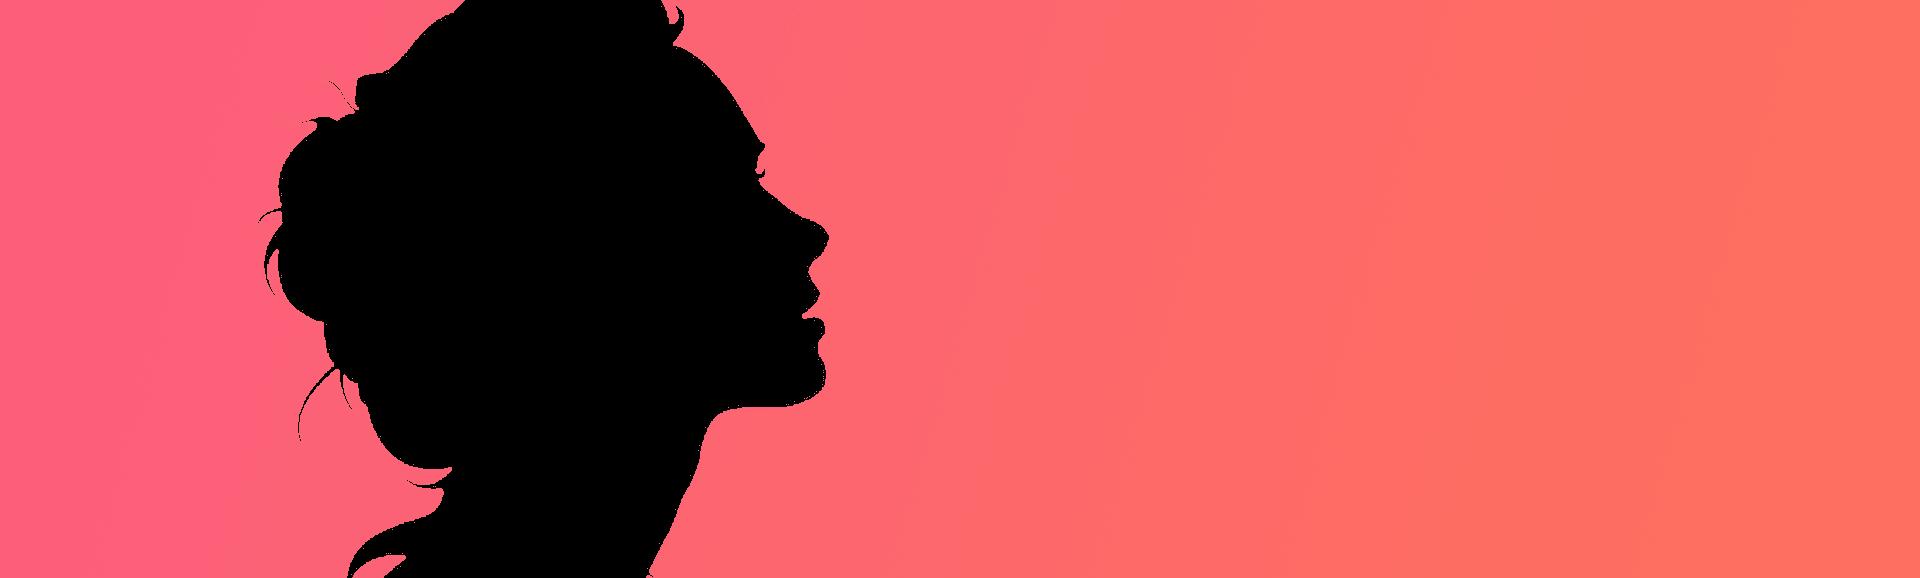 overlayer-image-opt